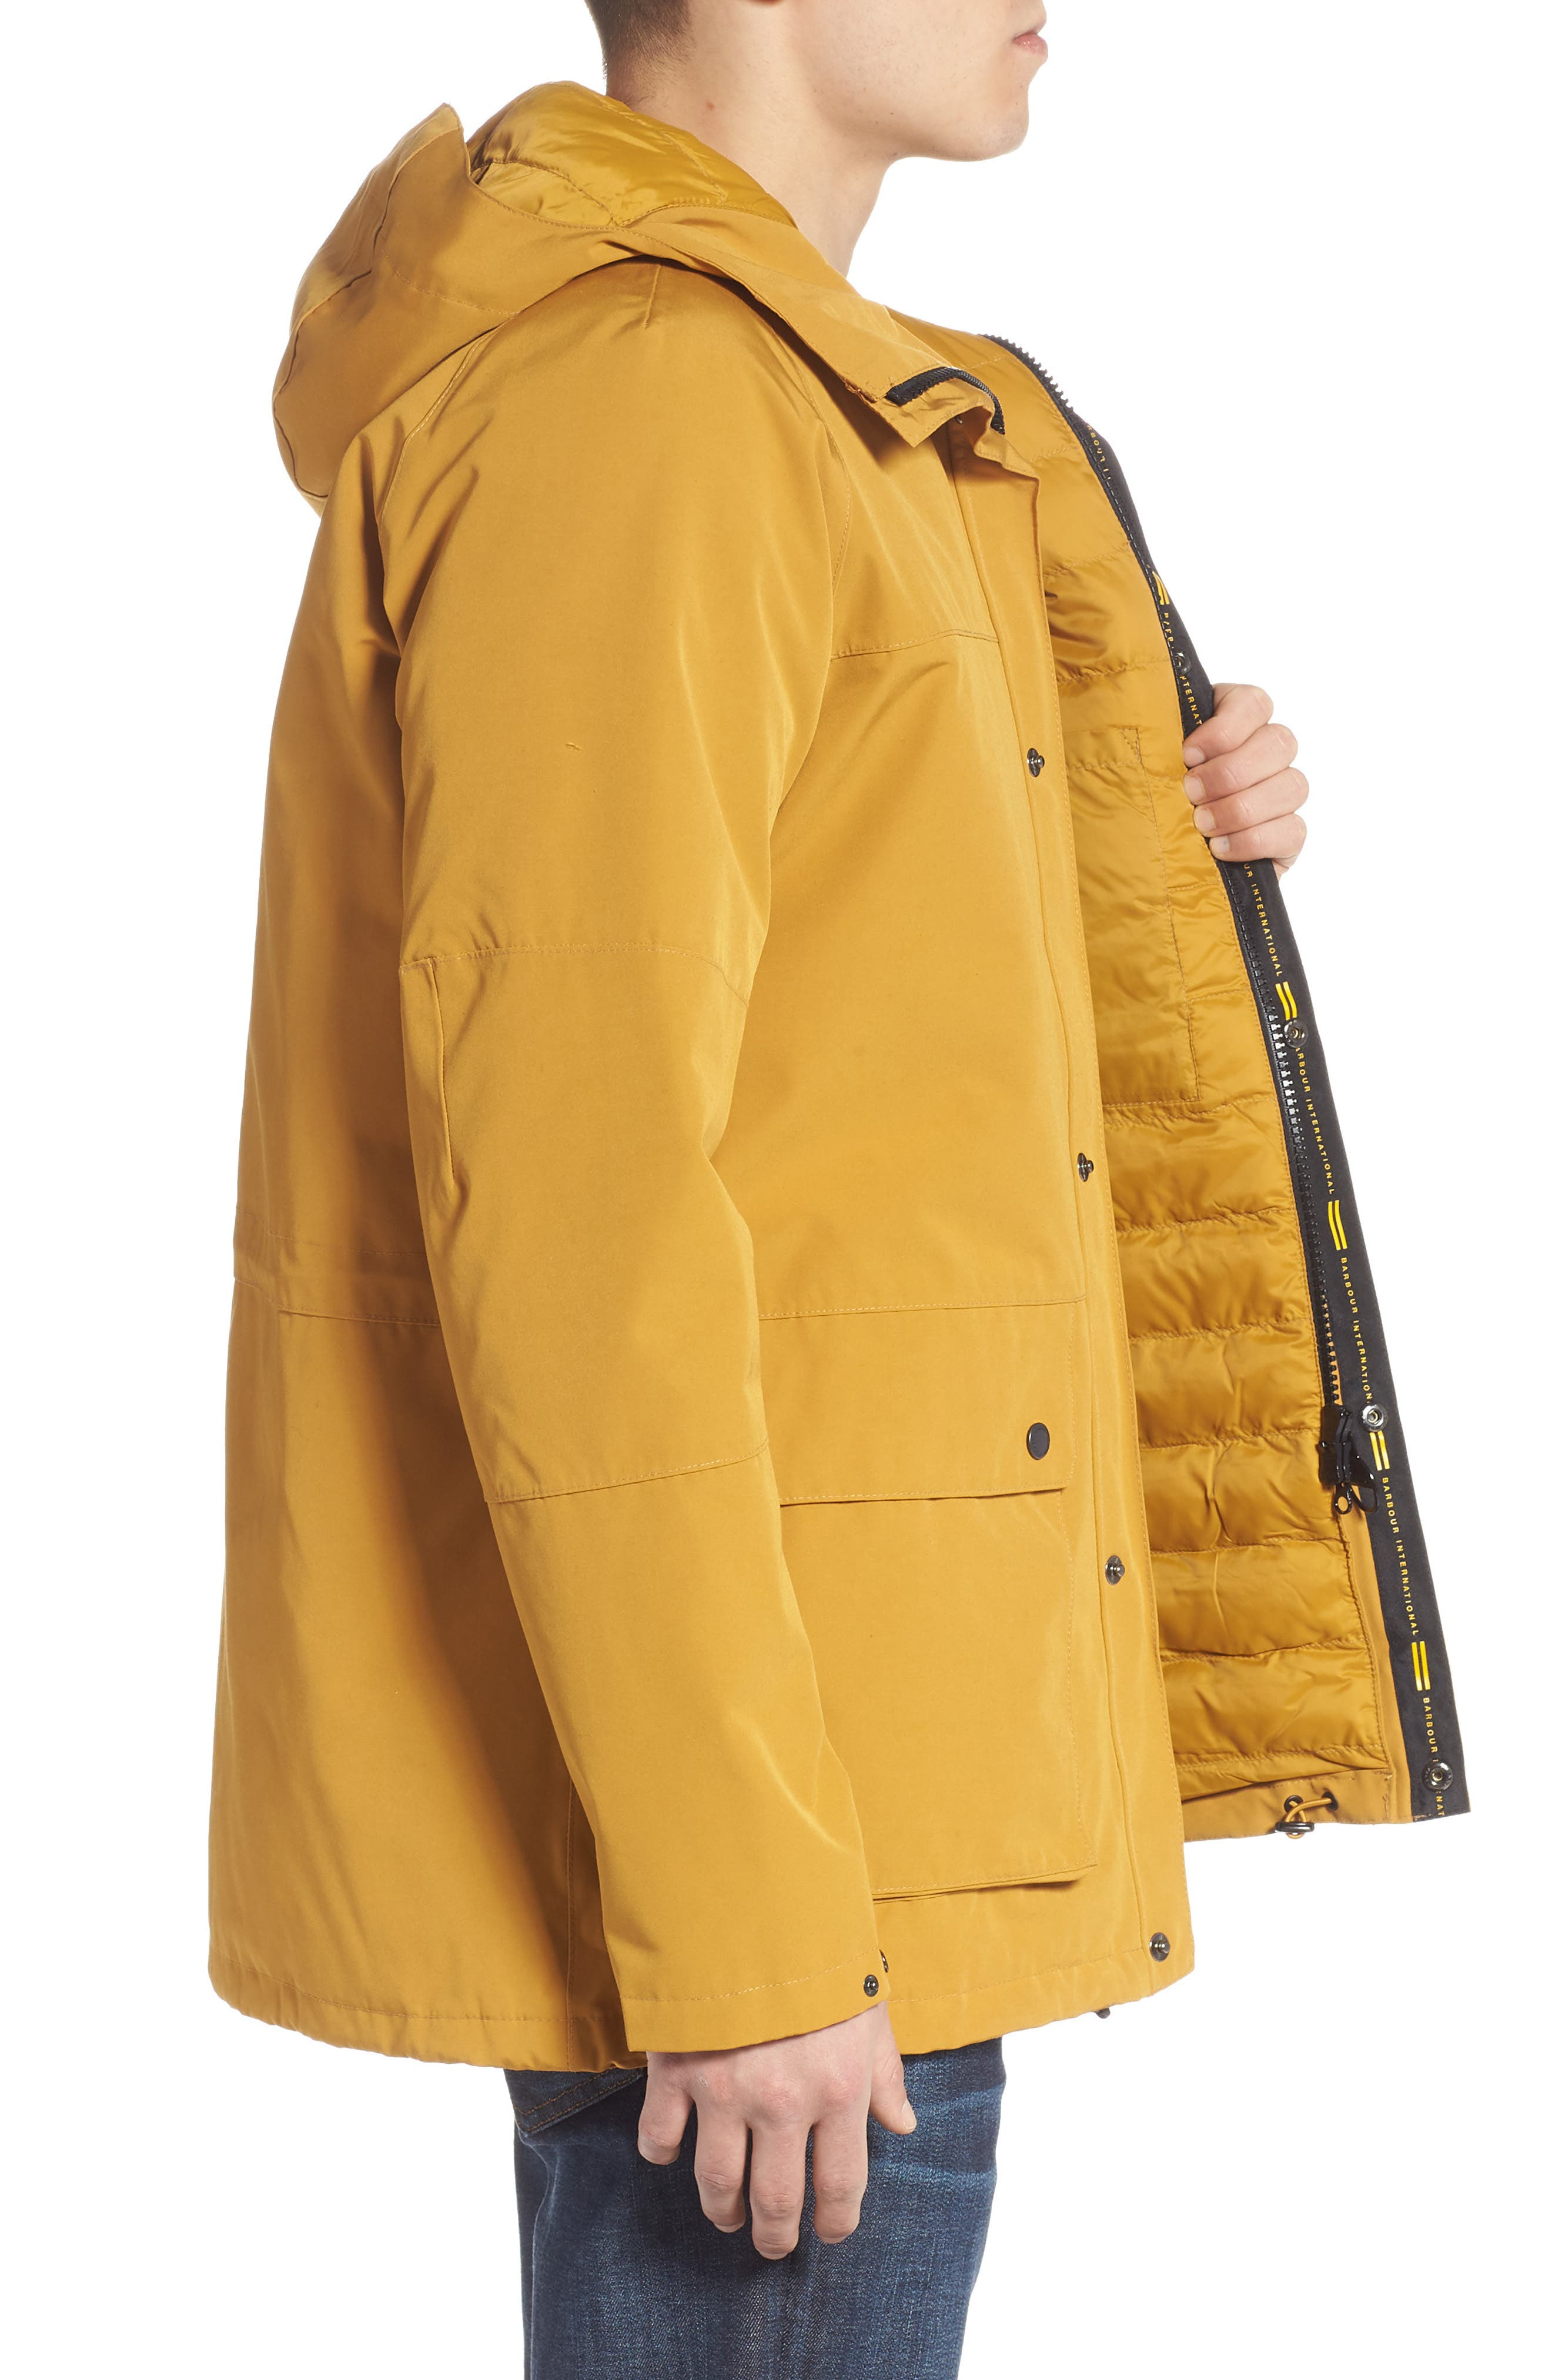 BARBOUR, Bi-Ridge Waterproof Hooded Jacket, Alternate thumbnail 3, color, YELLOW